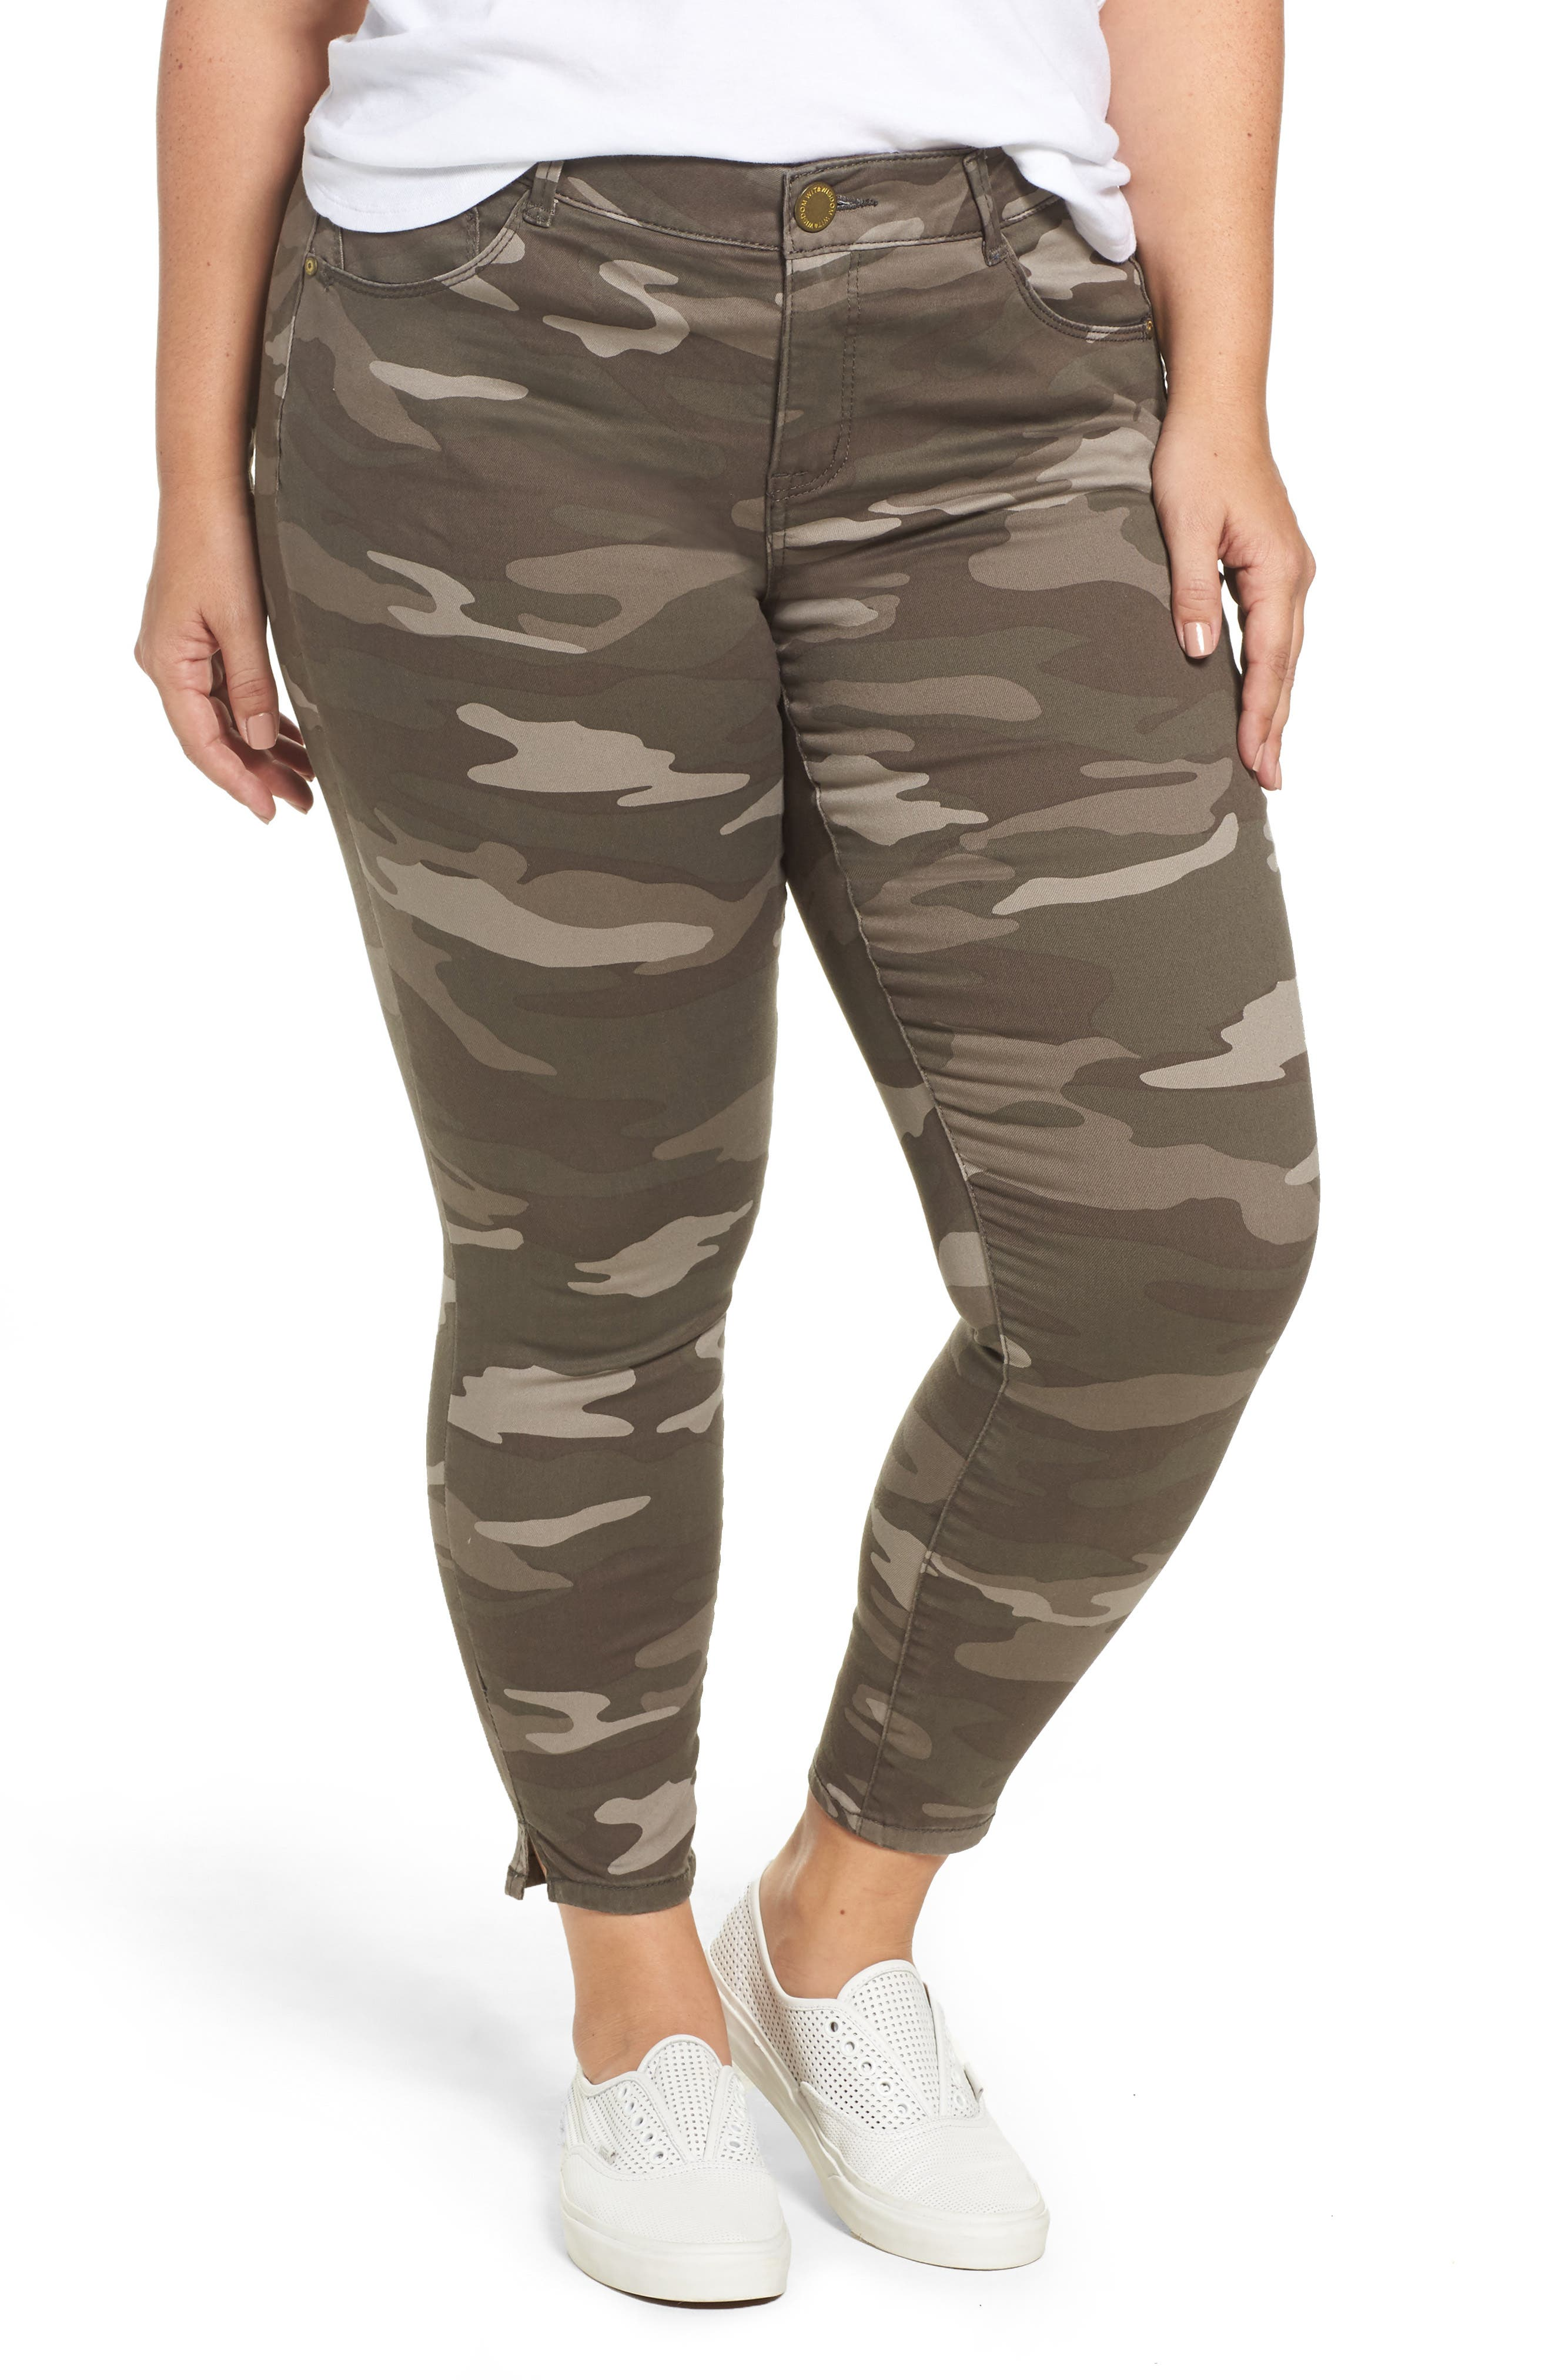 Ab-solution Camo Skinny Pants,                             Main thumbnail 1, color,                             250